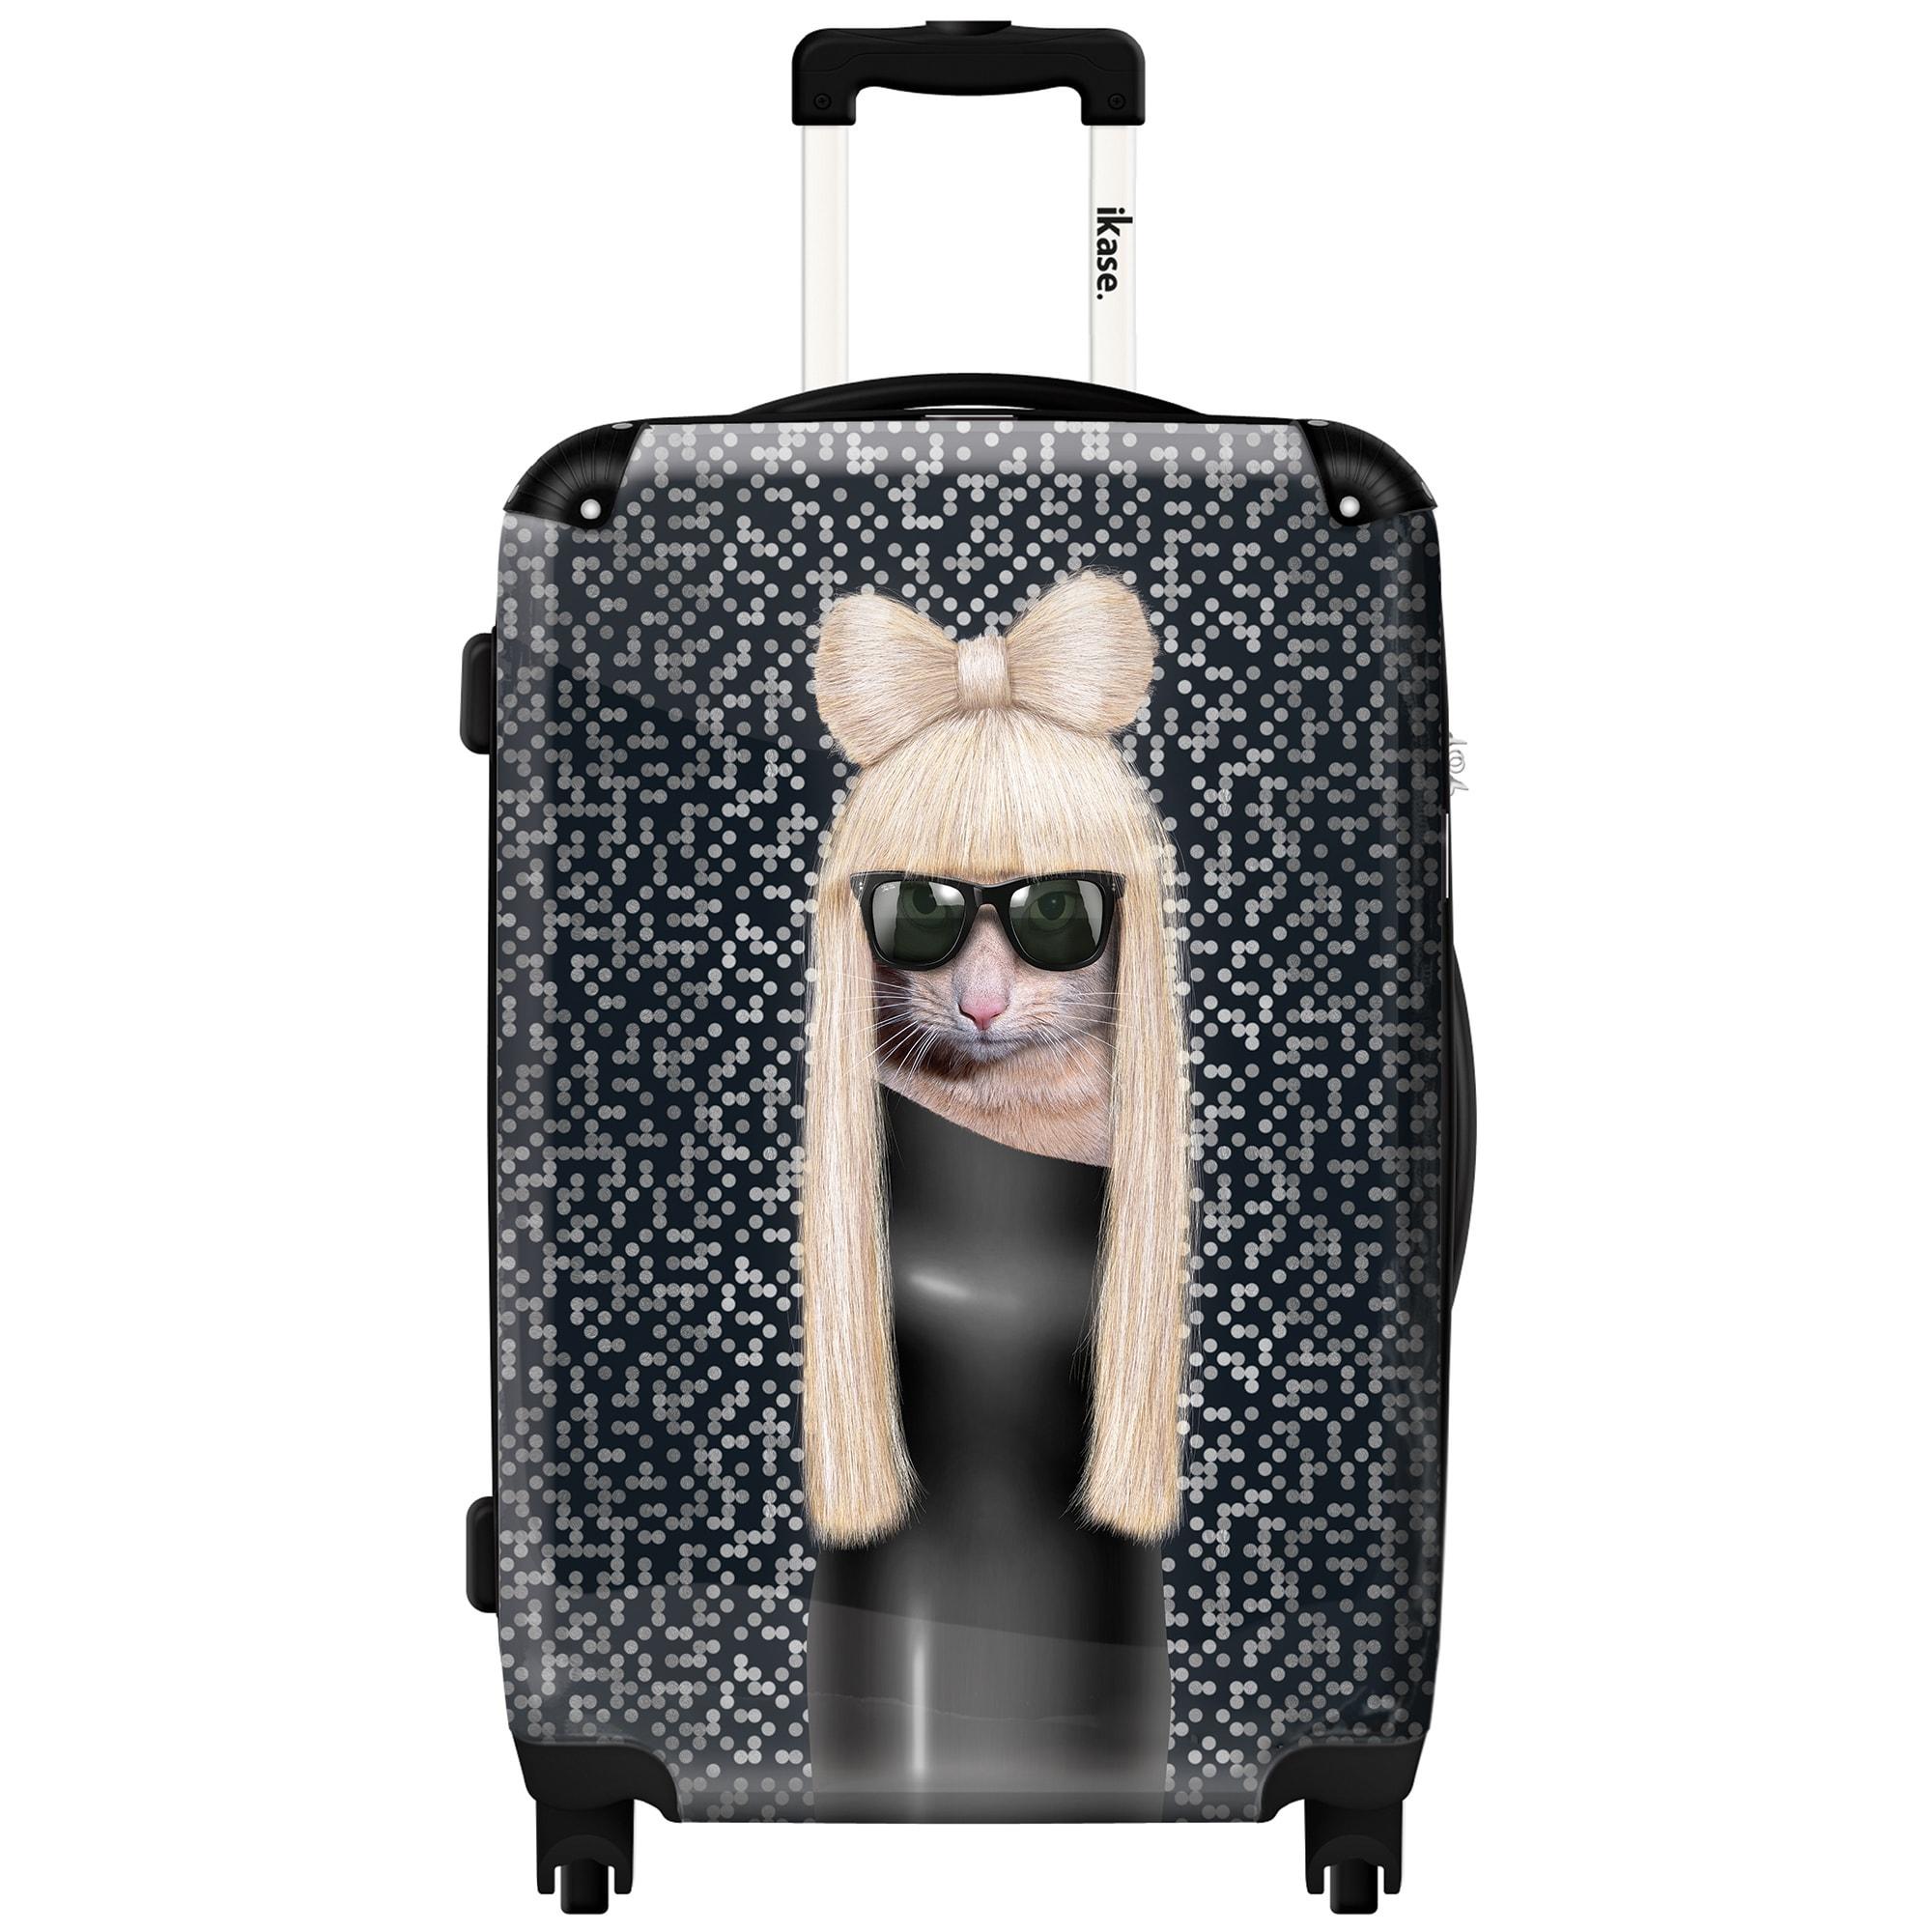 Ikase Hardside Spinner Luggage Gg artwork 4